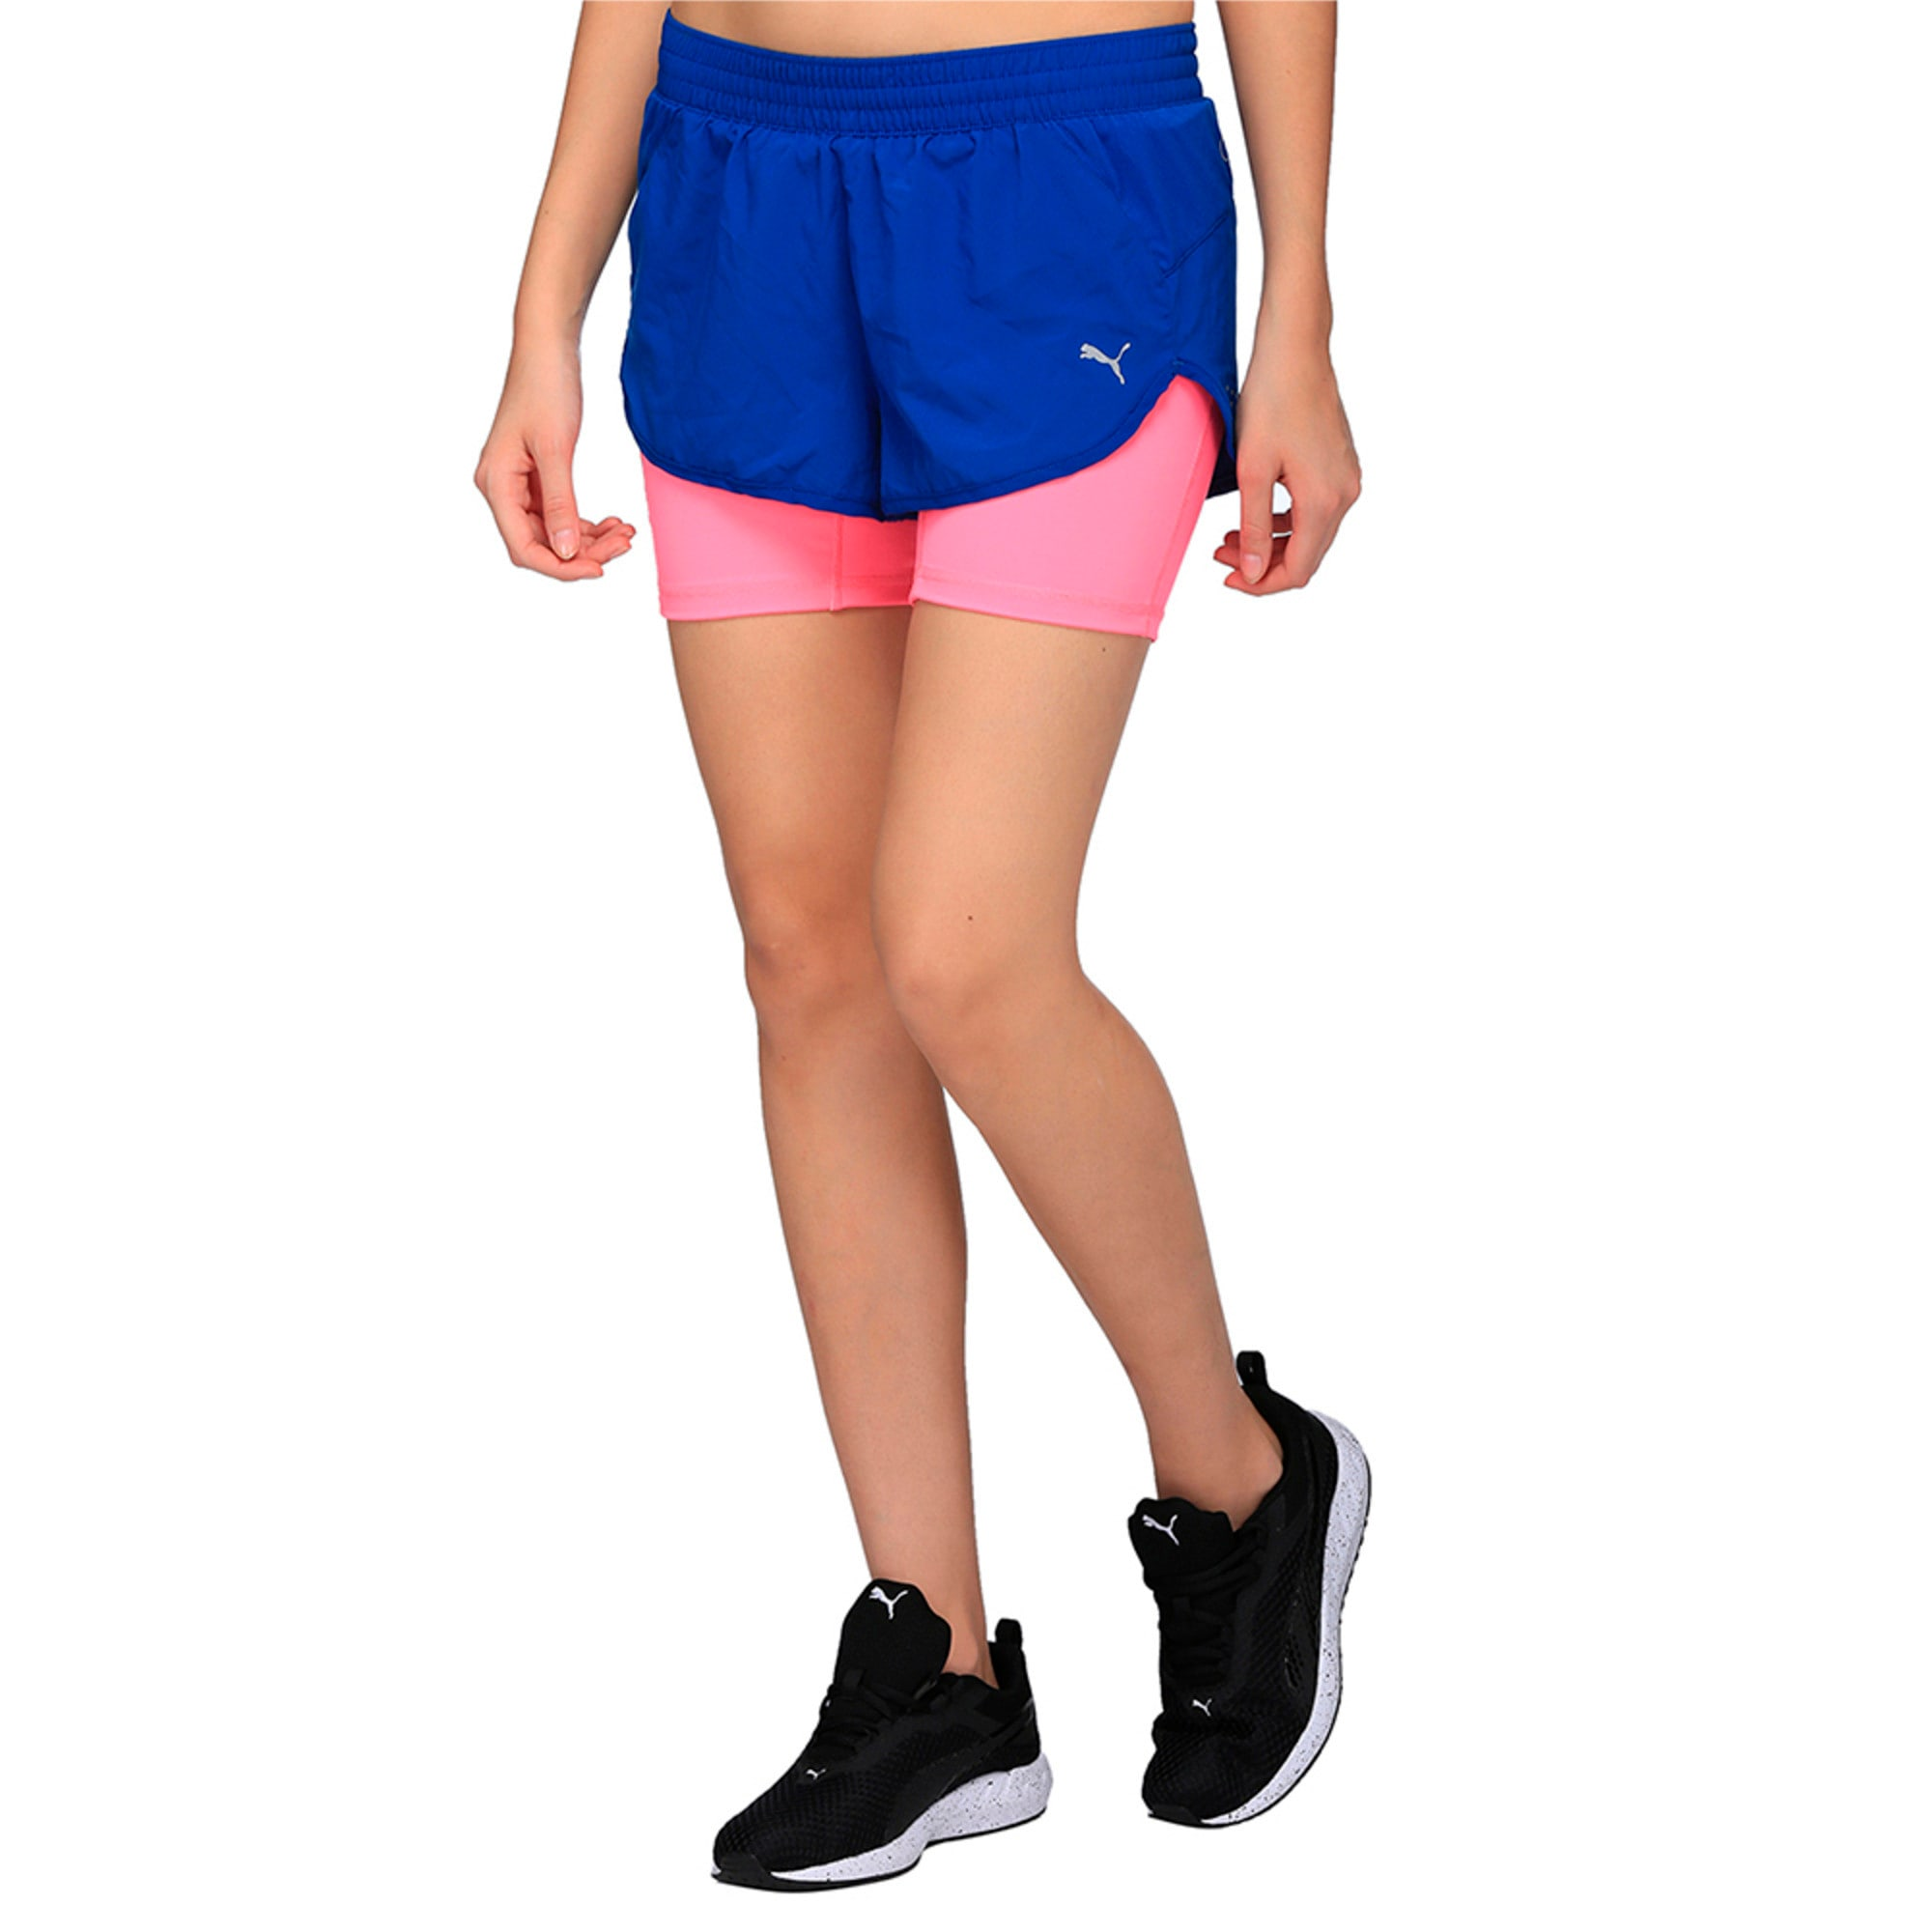 Thumbnail 1 of Running Women's Blast 2 in 1 Shorts, TRUE BLUE-KNOCKOUT PINK, medium-IND